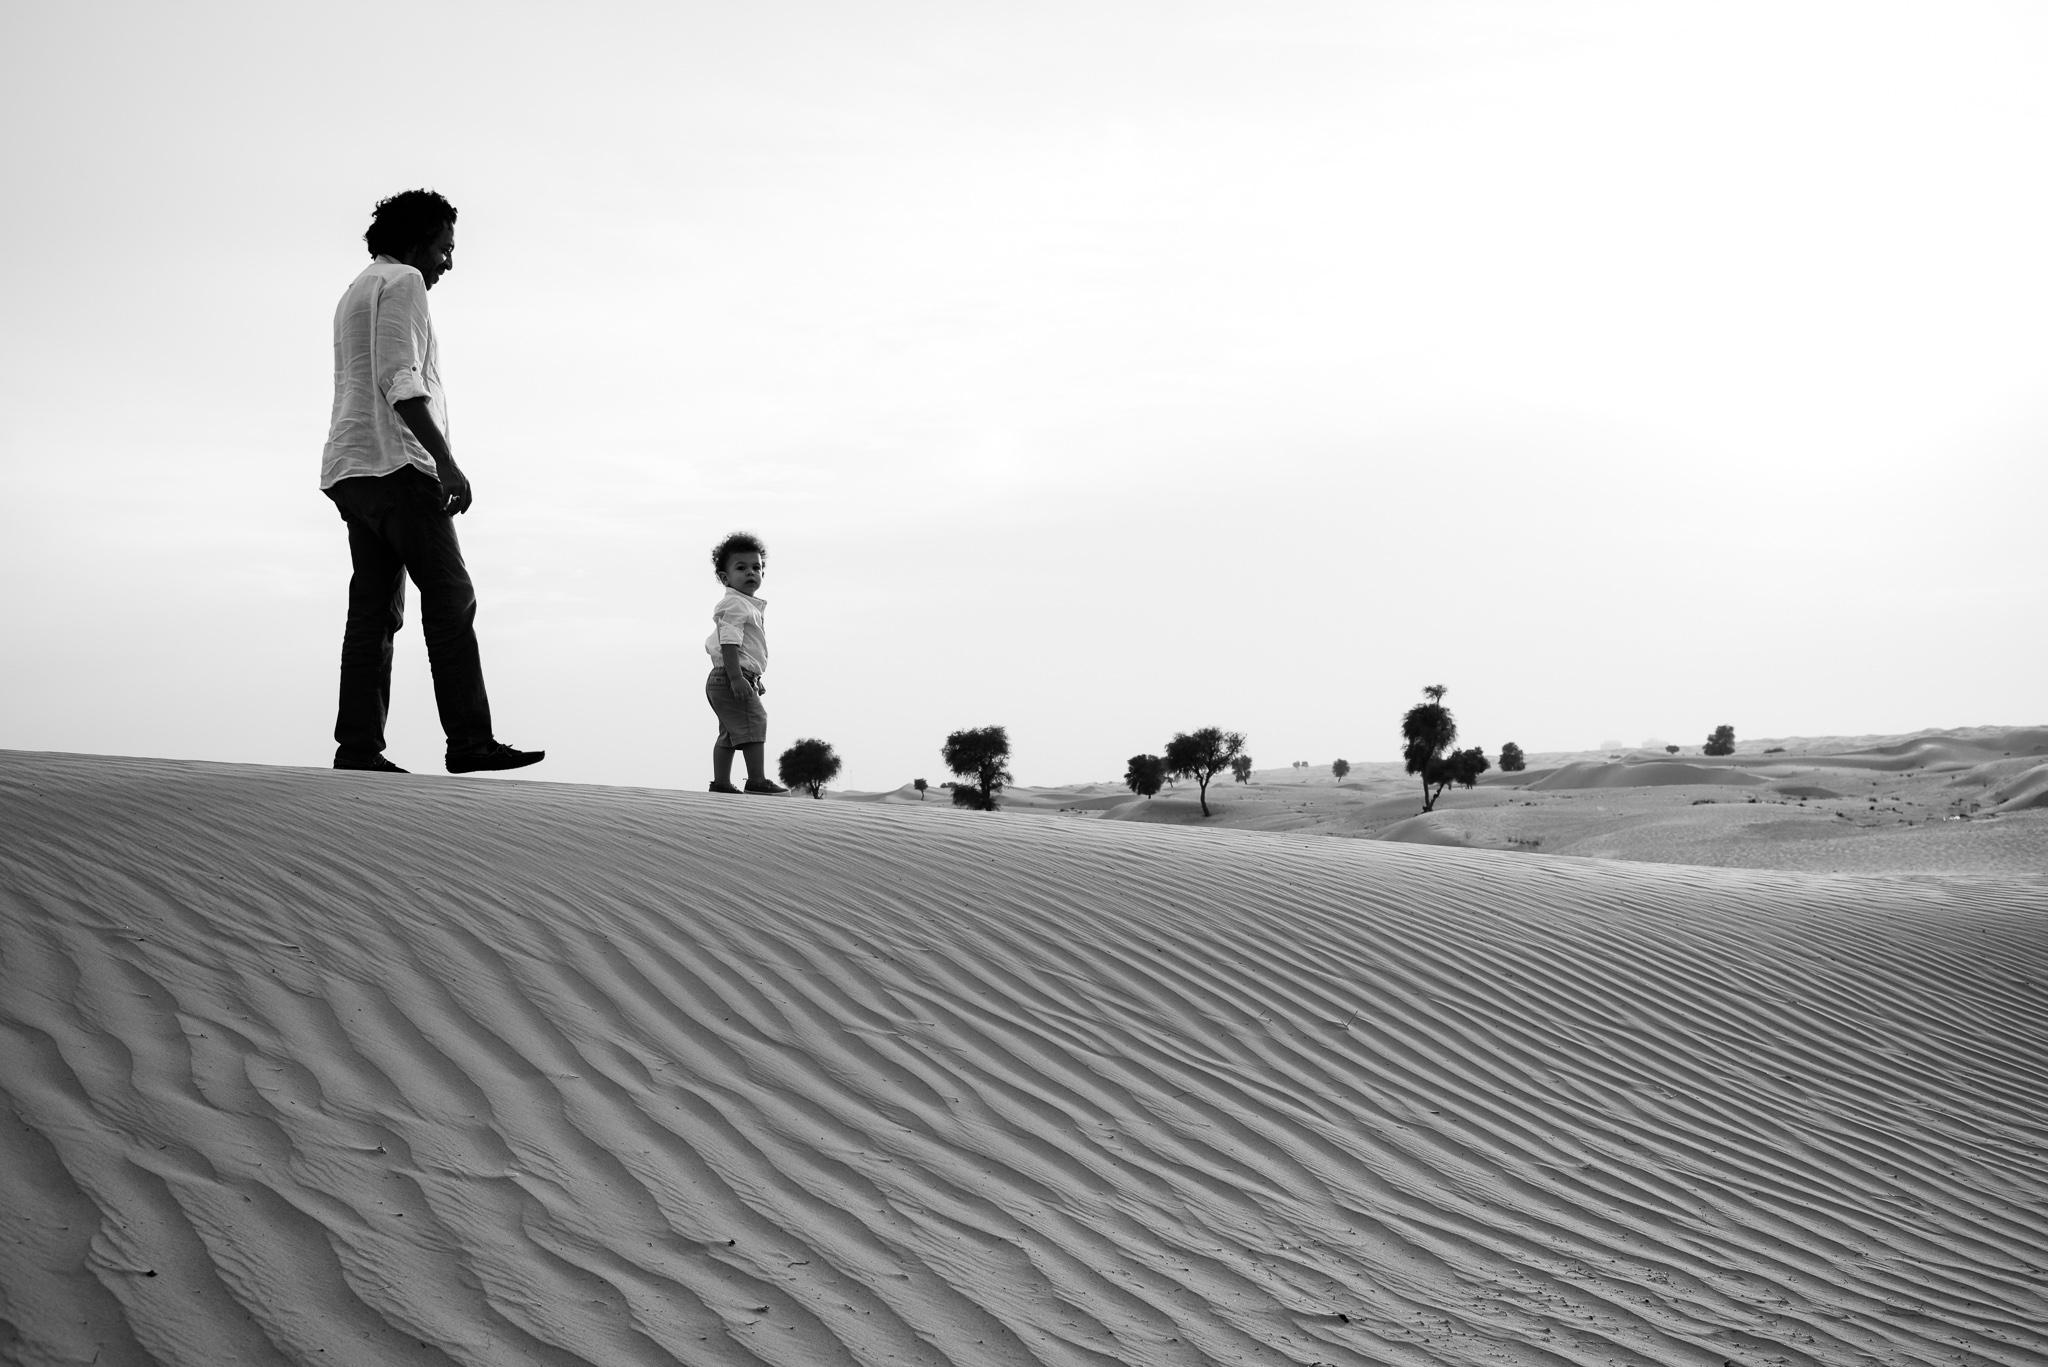 Lana-Photographs-Dubai-Maternity-Photographer-FatimaE-PSLR-24.jpg